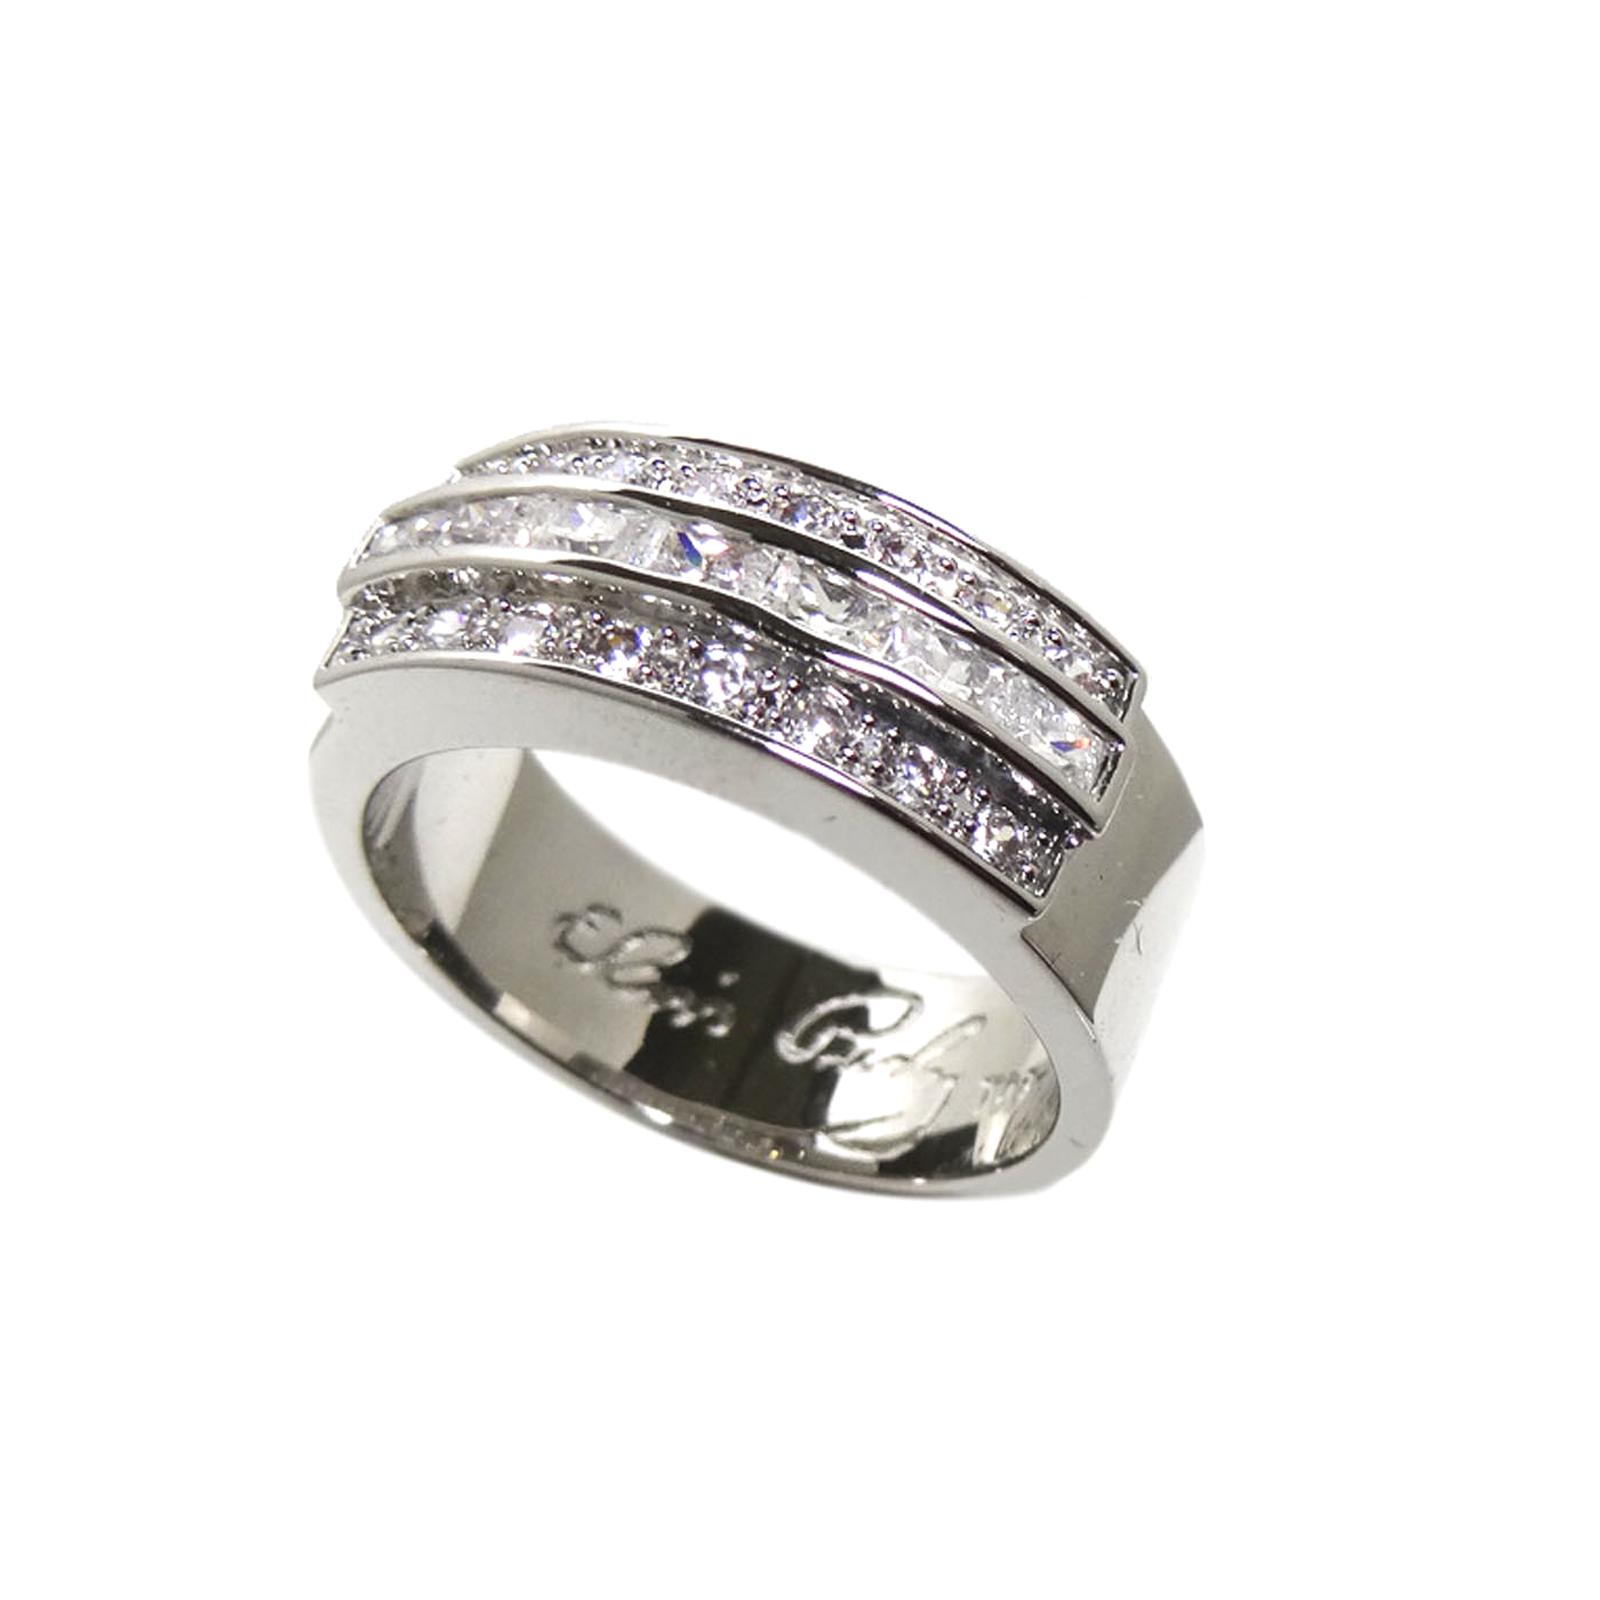 Wedding Ring Solid Silver With Swarovski Crystals